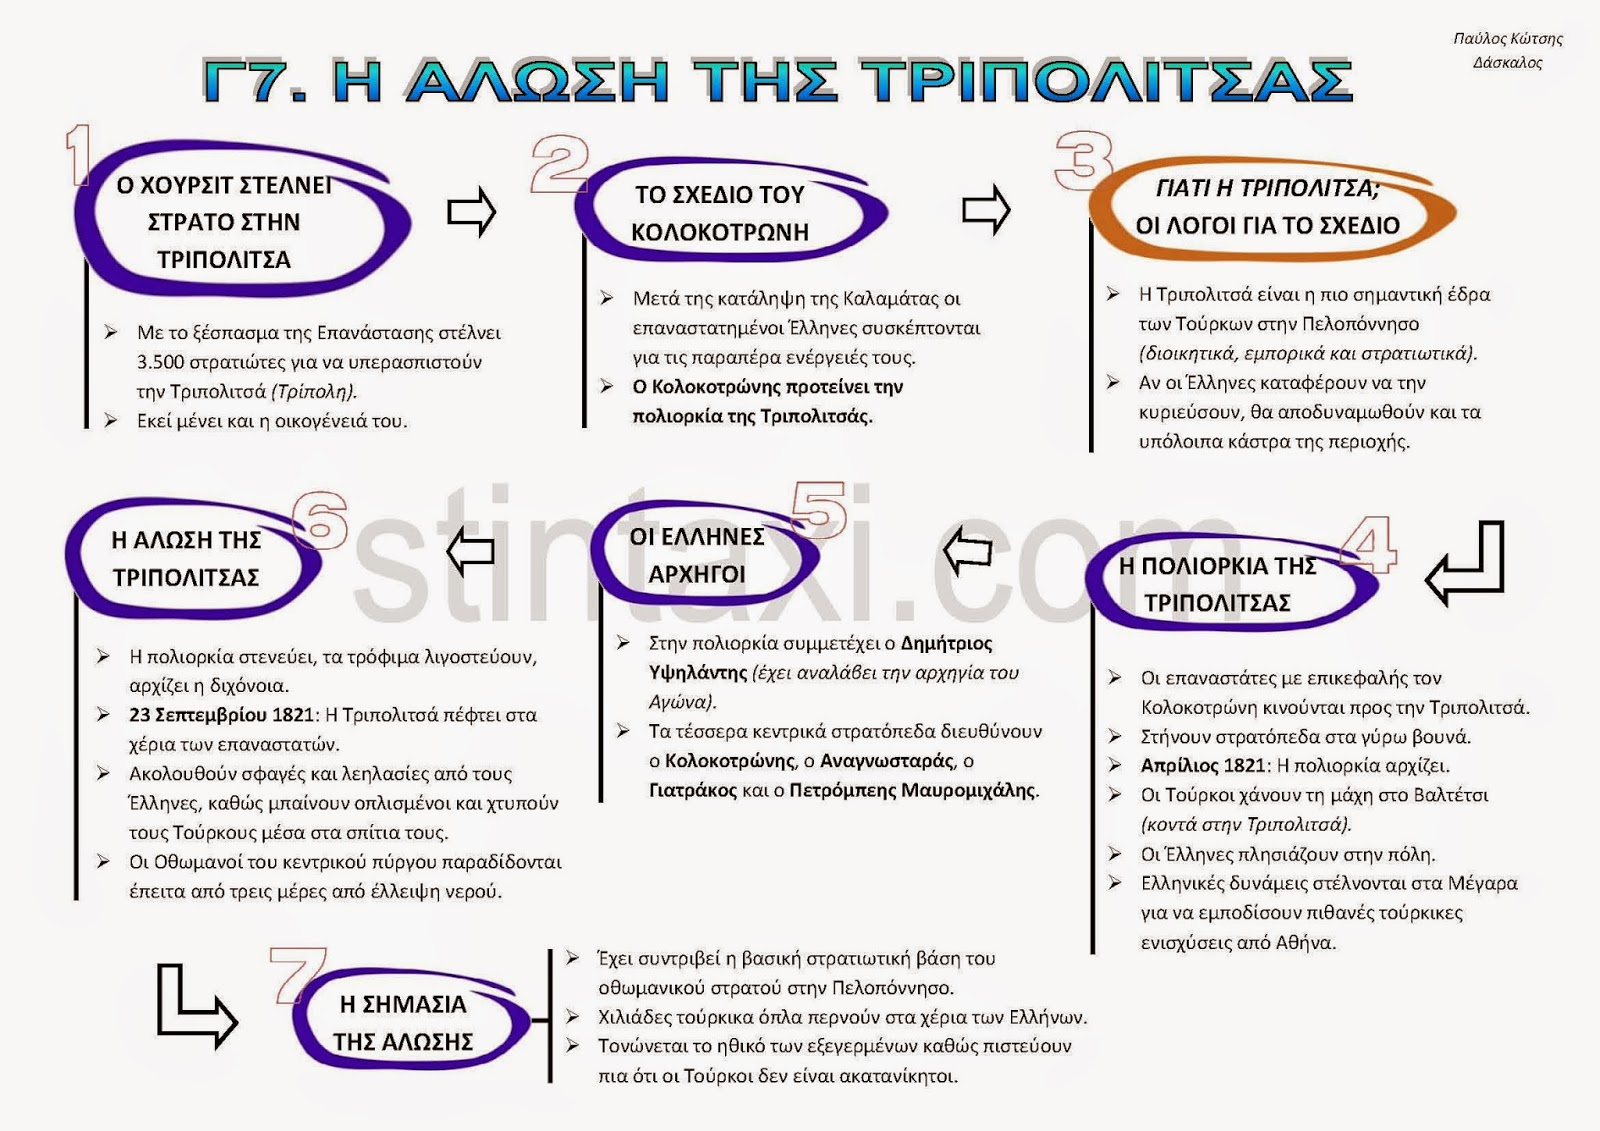 http://www.stintaxi.com/uploads/1/3/1/0/13100858/c7-alosi-tripol-v2.1.pdf